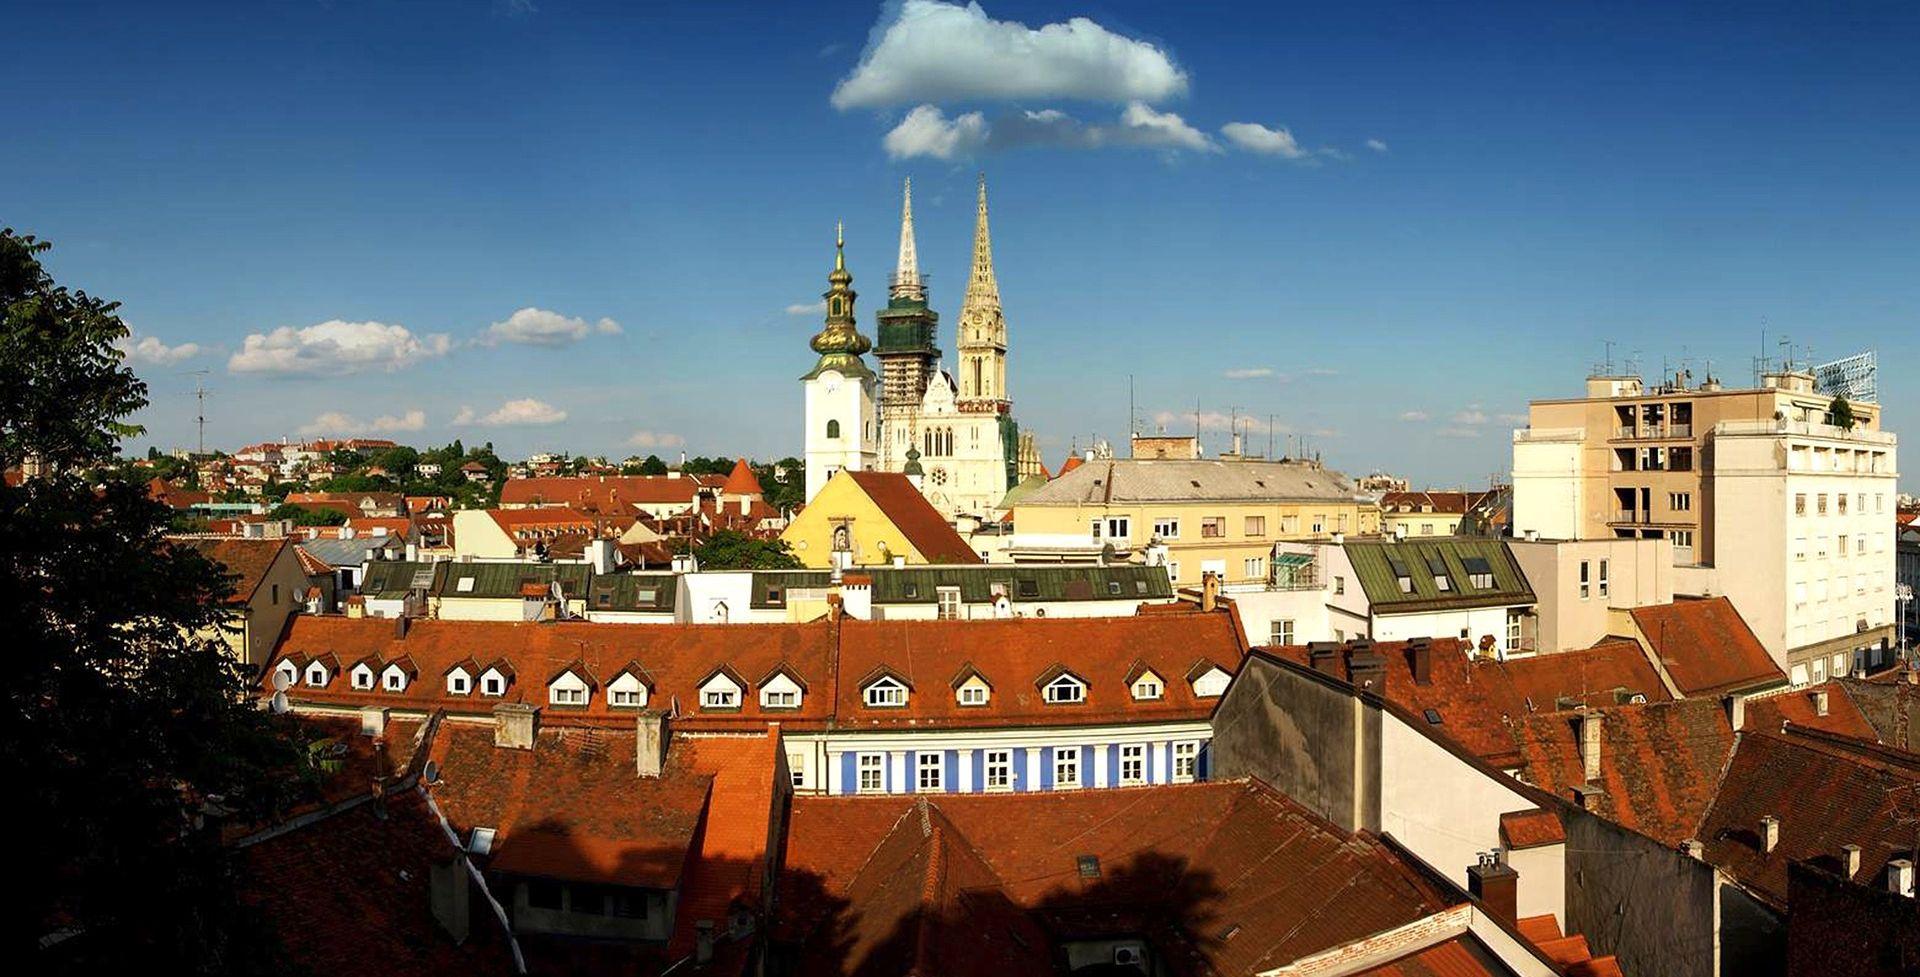 Projekt grada Zagreba dobio sredstva iz EU fondova